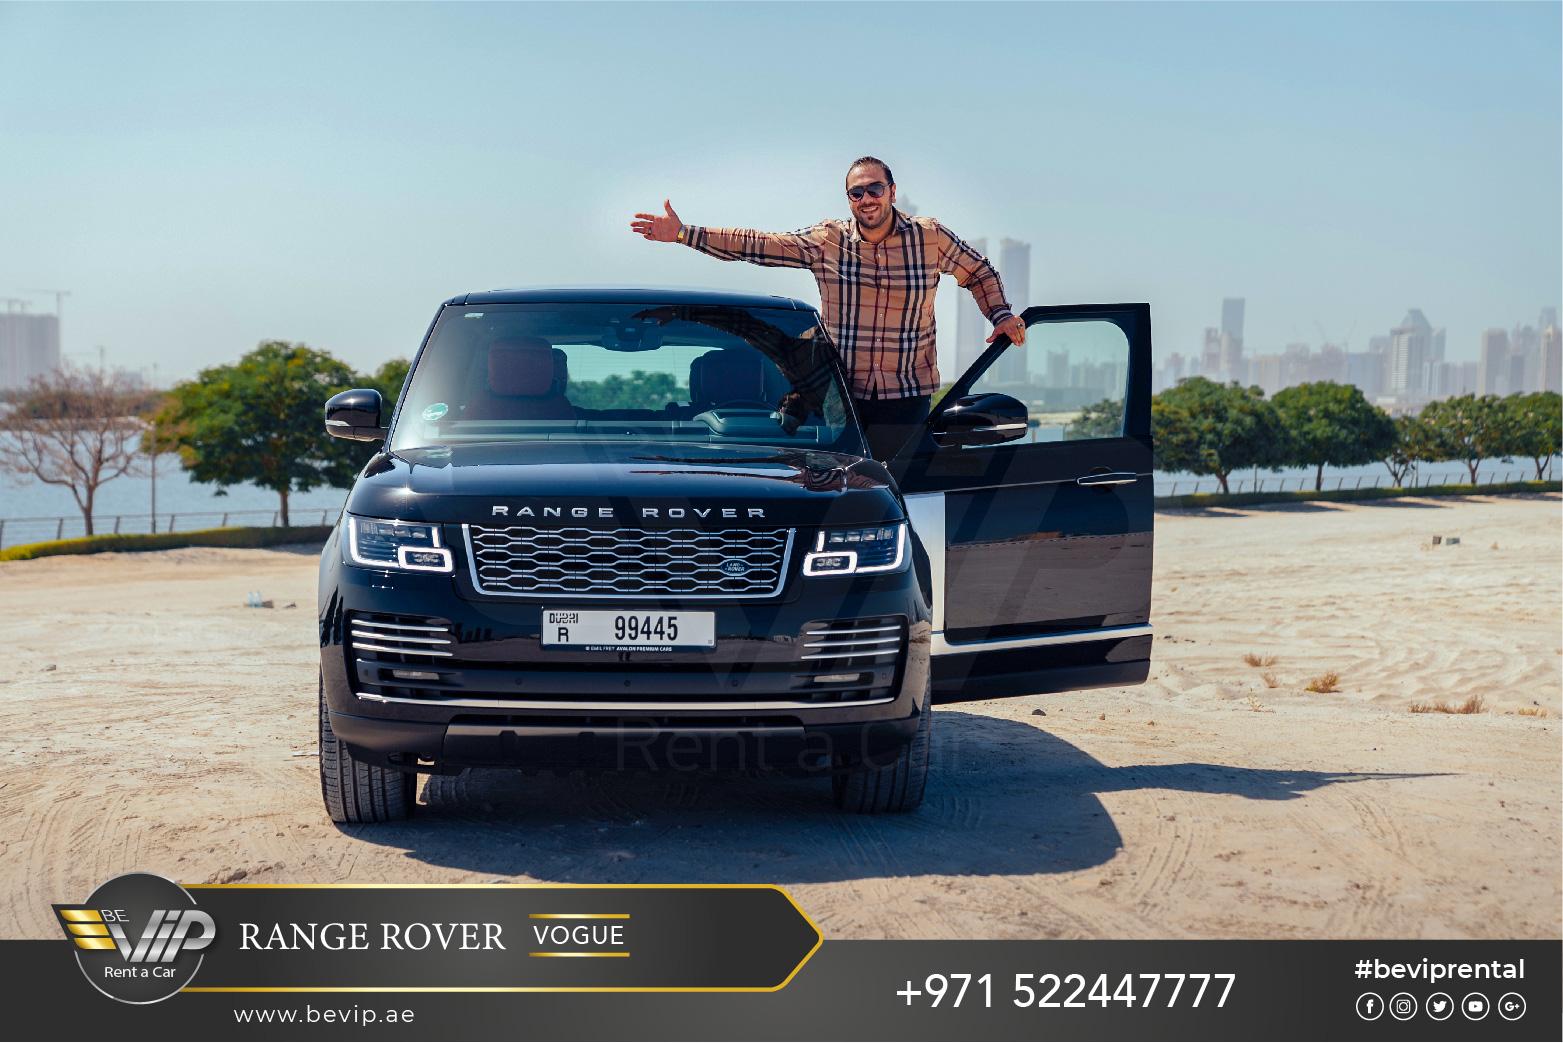 Luxury-car-rental-in-dubai_Range-Rover-for-rent-in-Dubai_-05.jpg